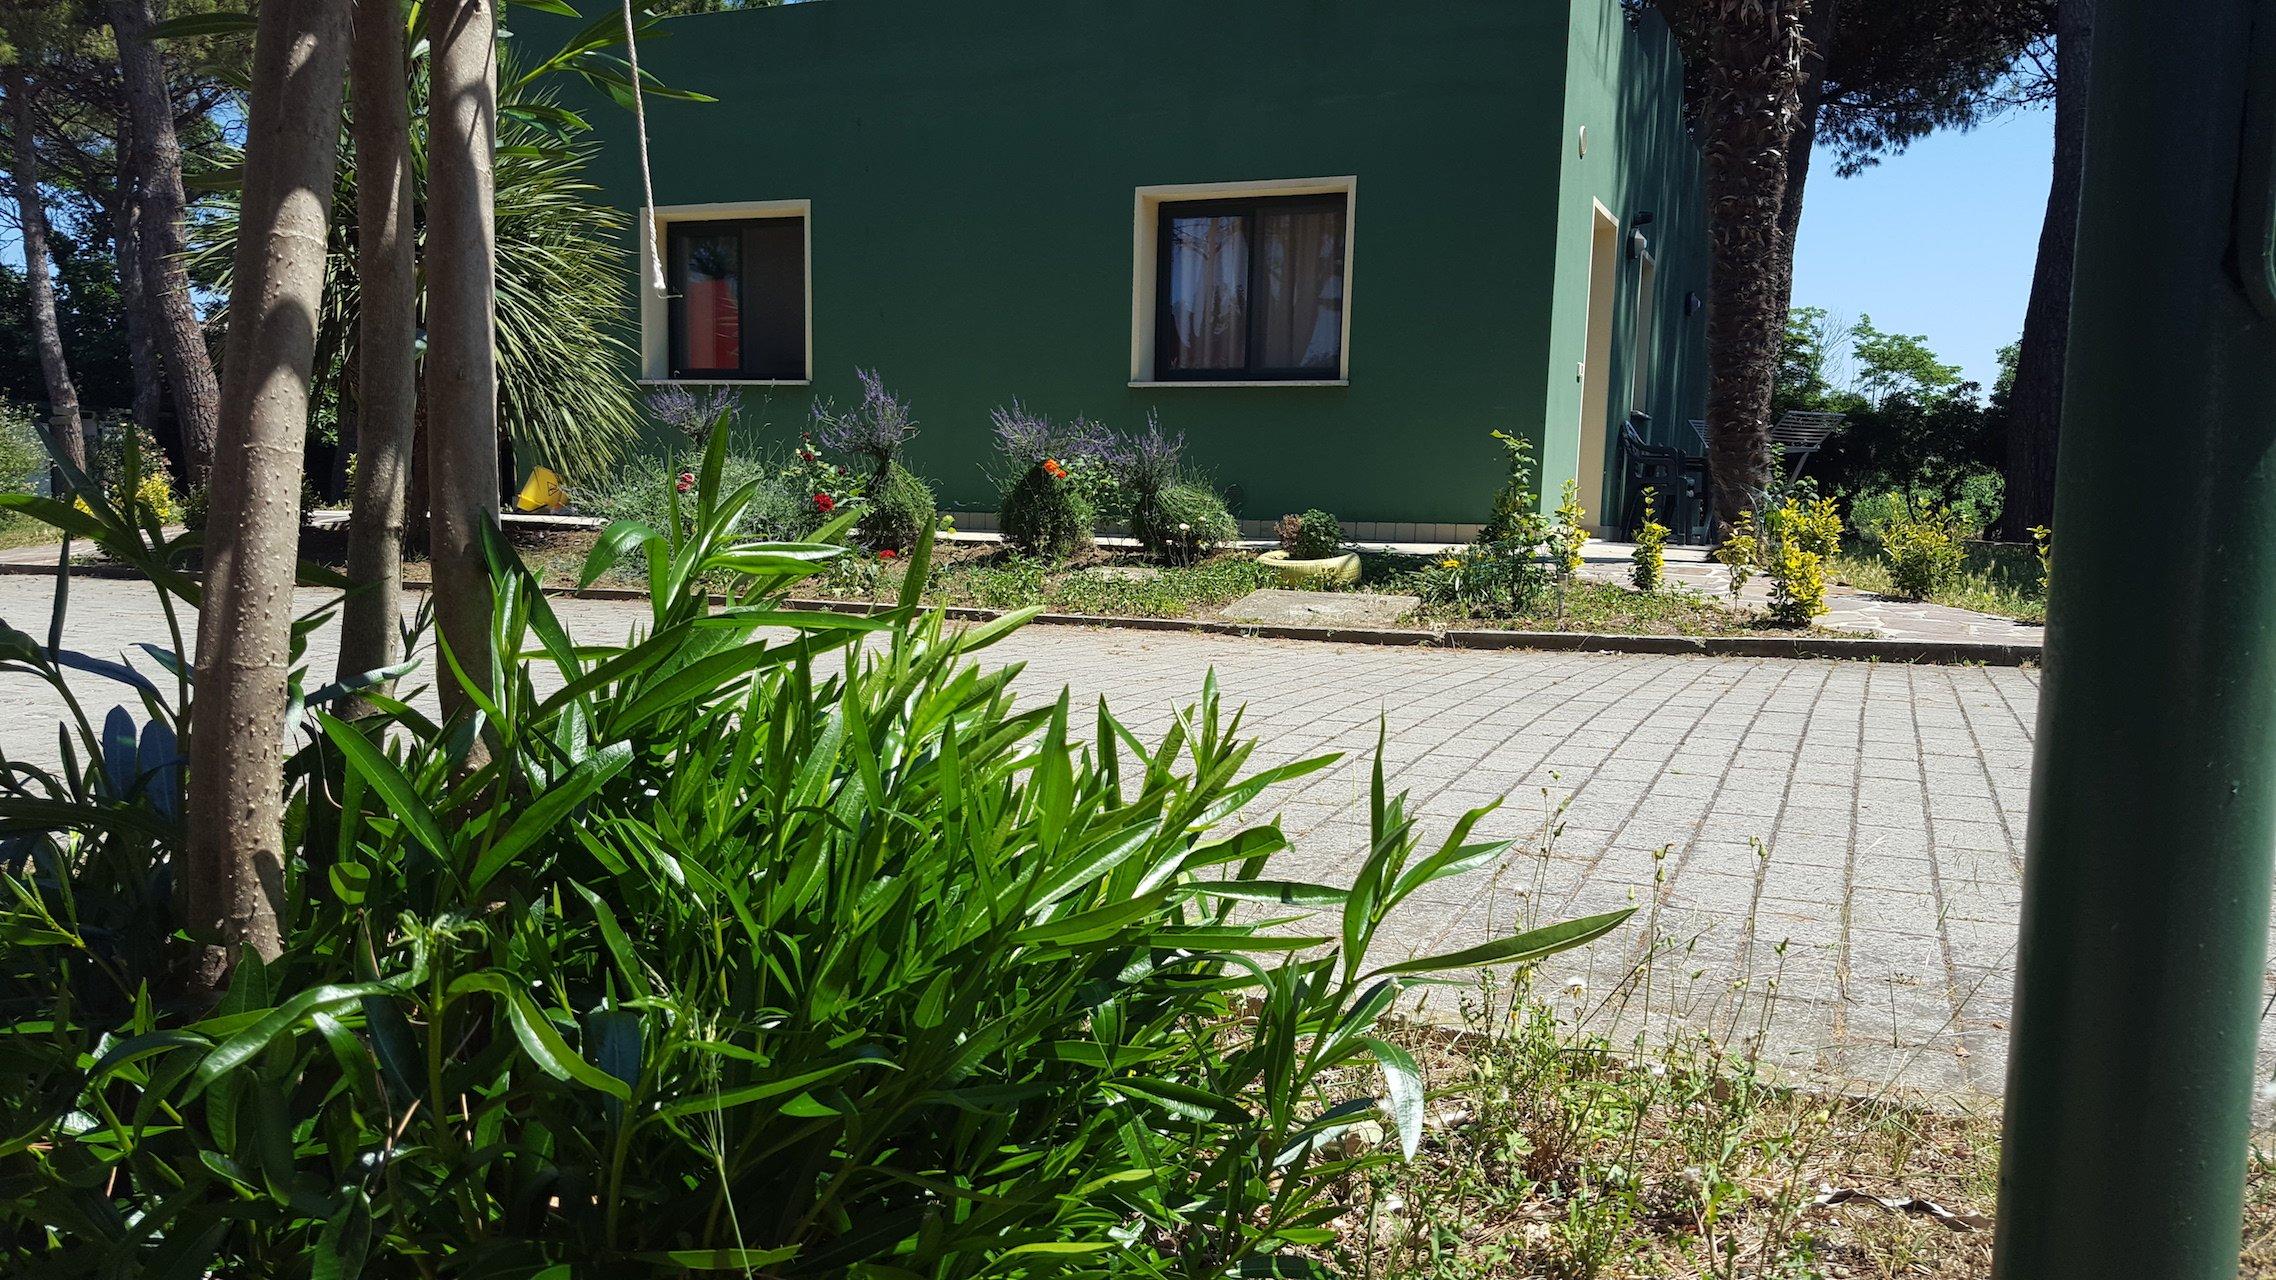 mithos village misano garden